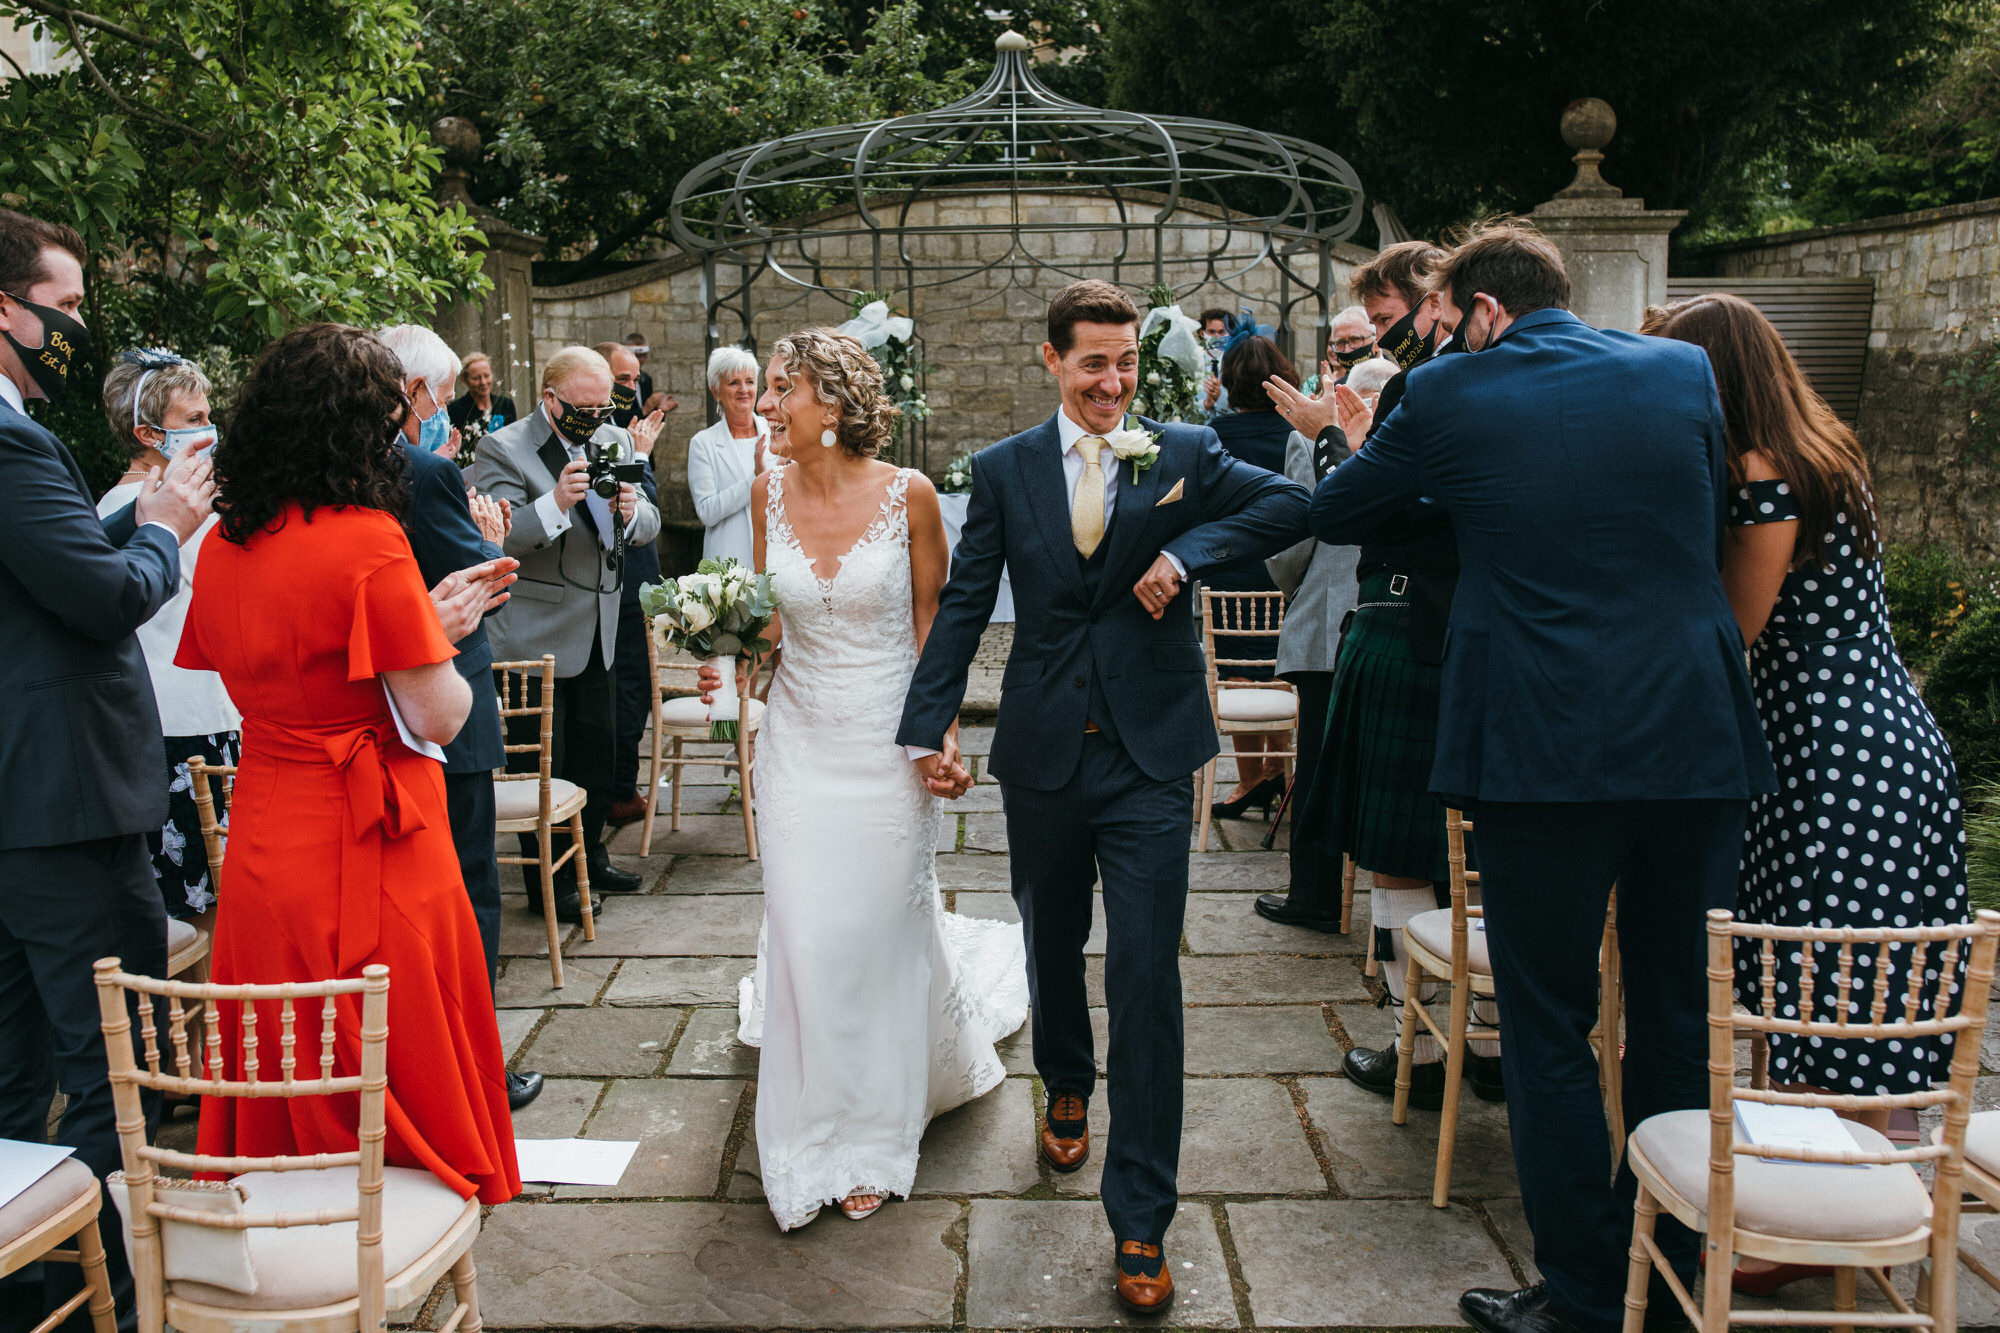 Royal crescent hotel wedding walled garden